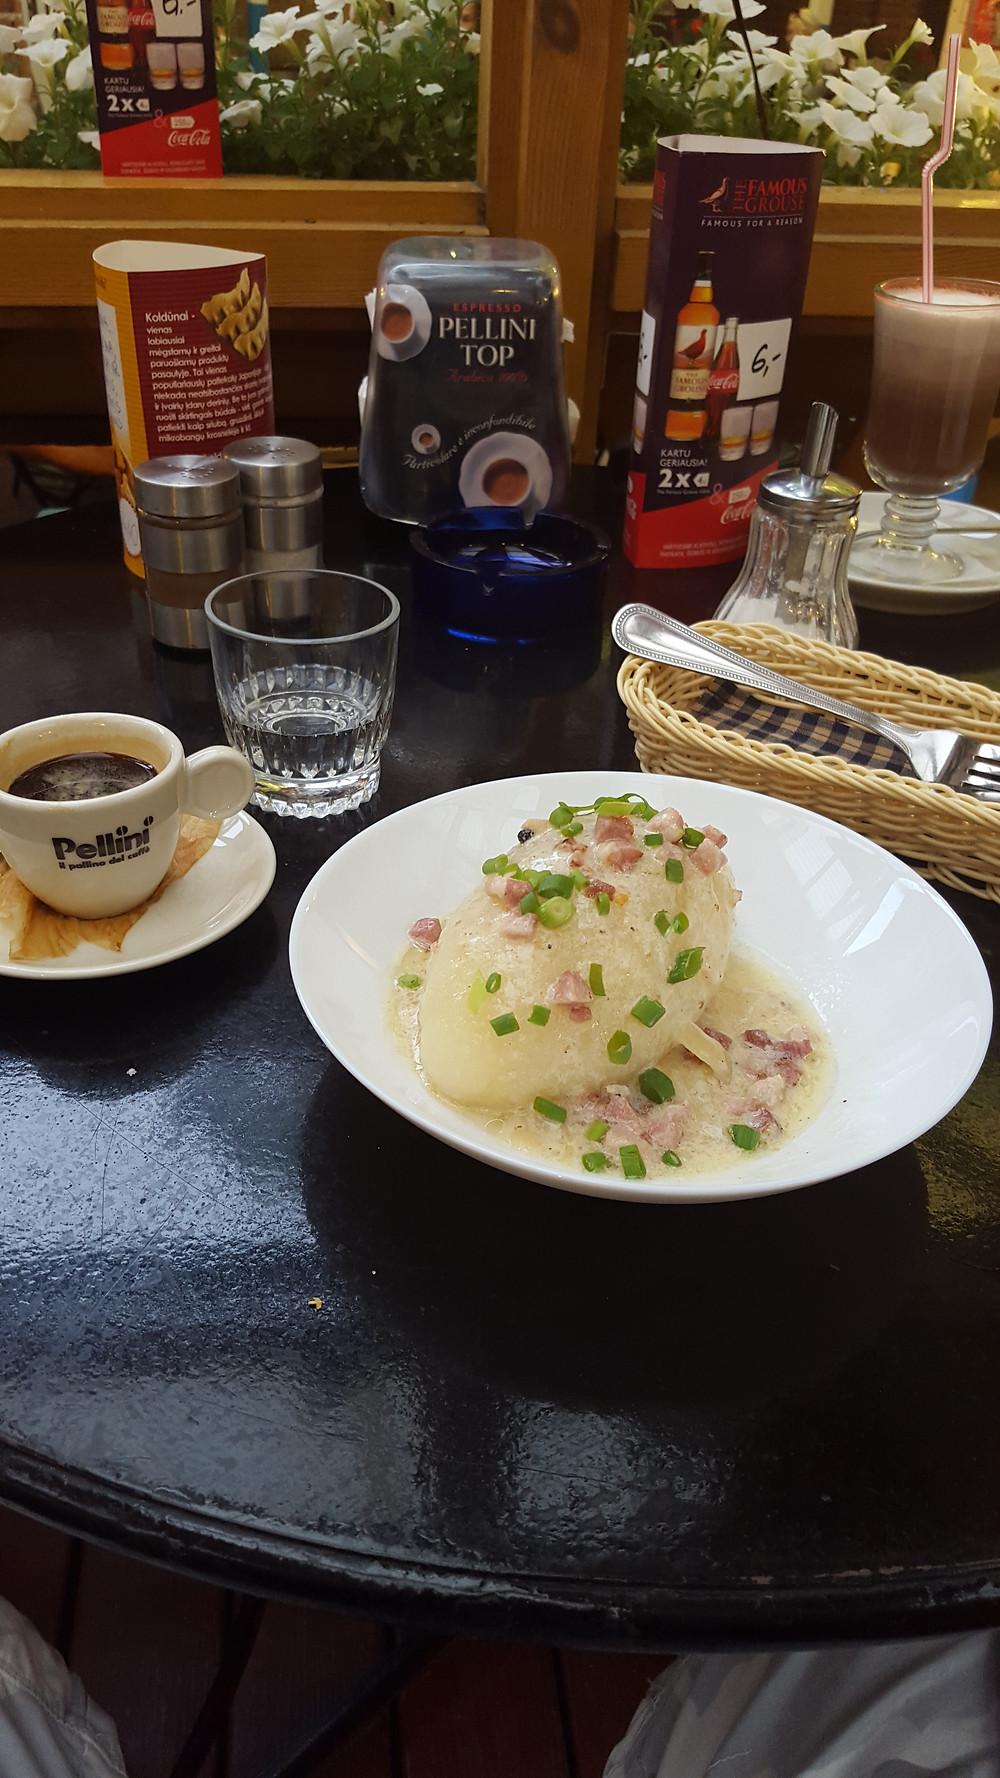 цепелины, литовская кухня, OvLGroup,